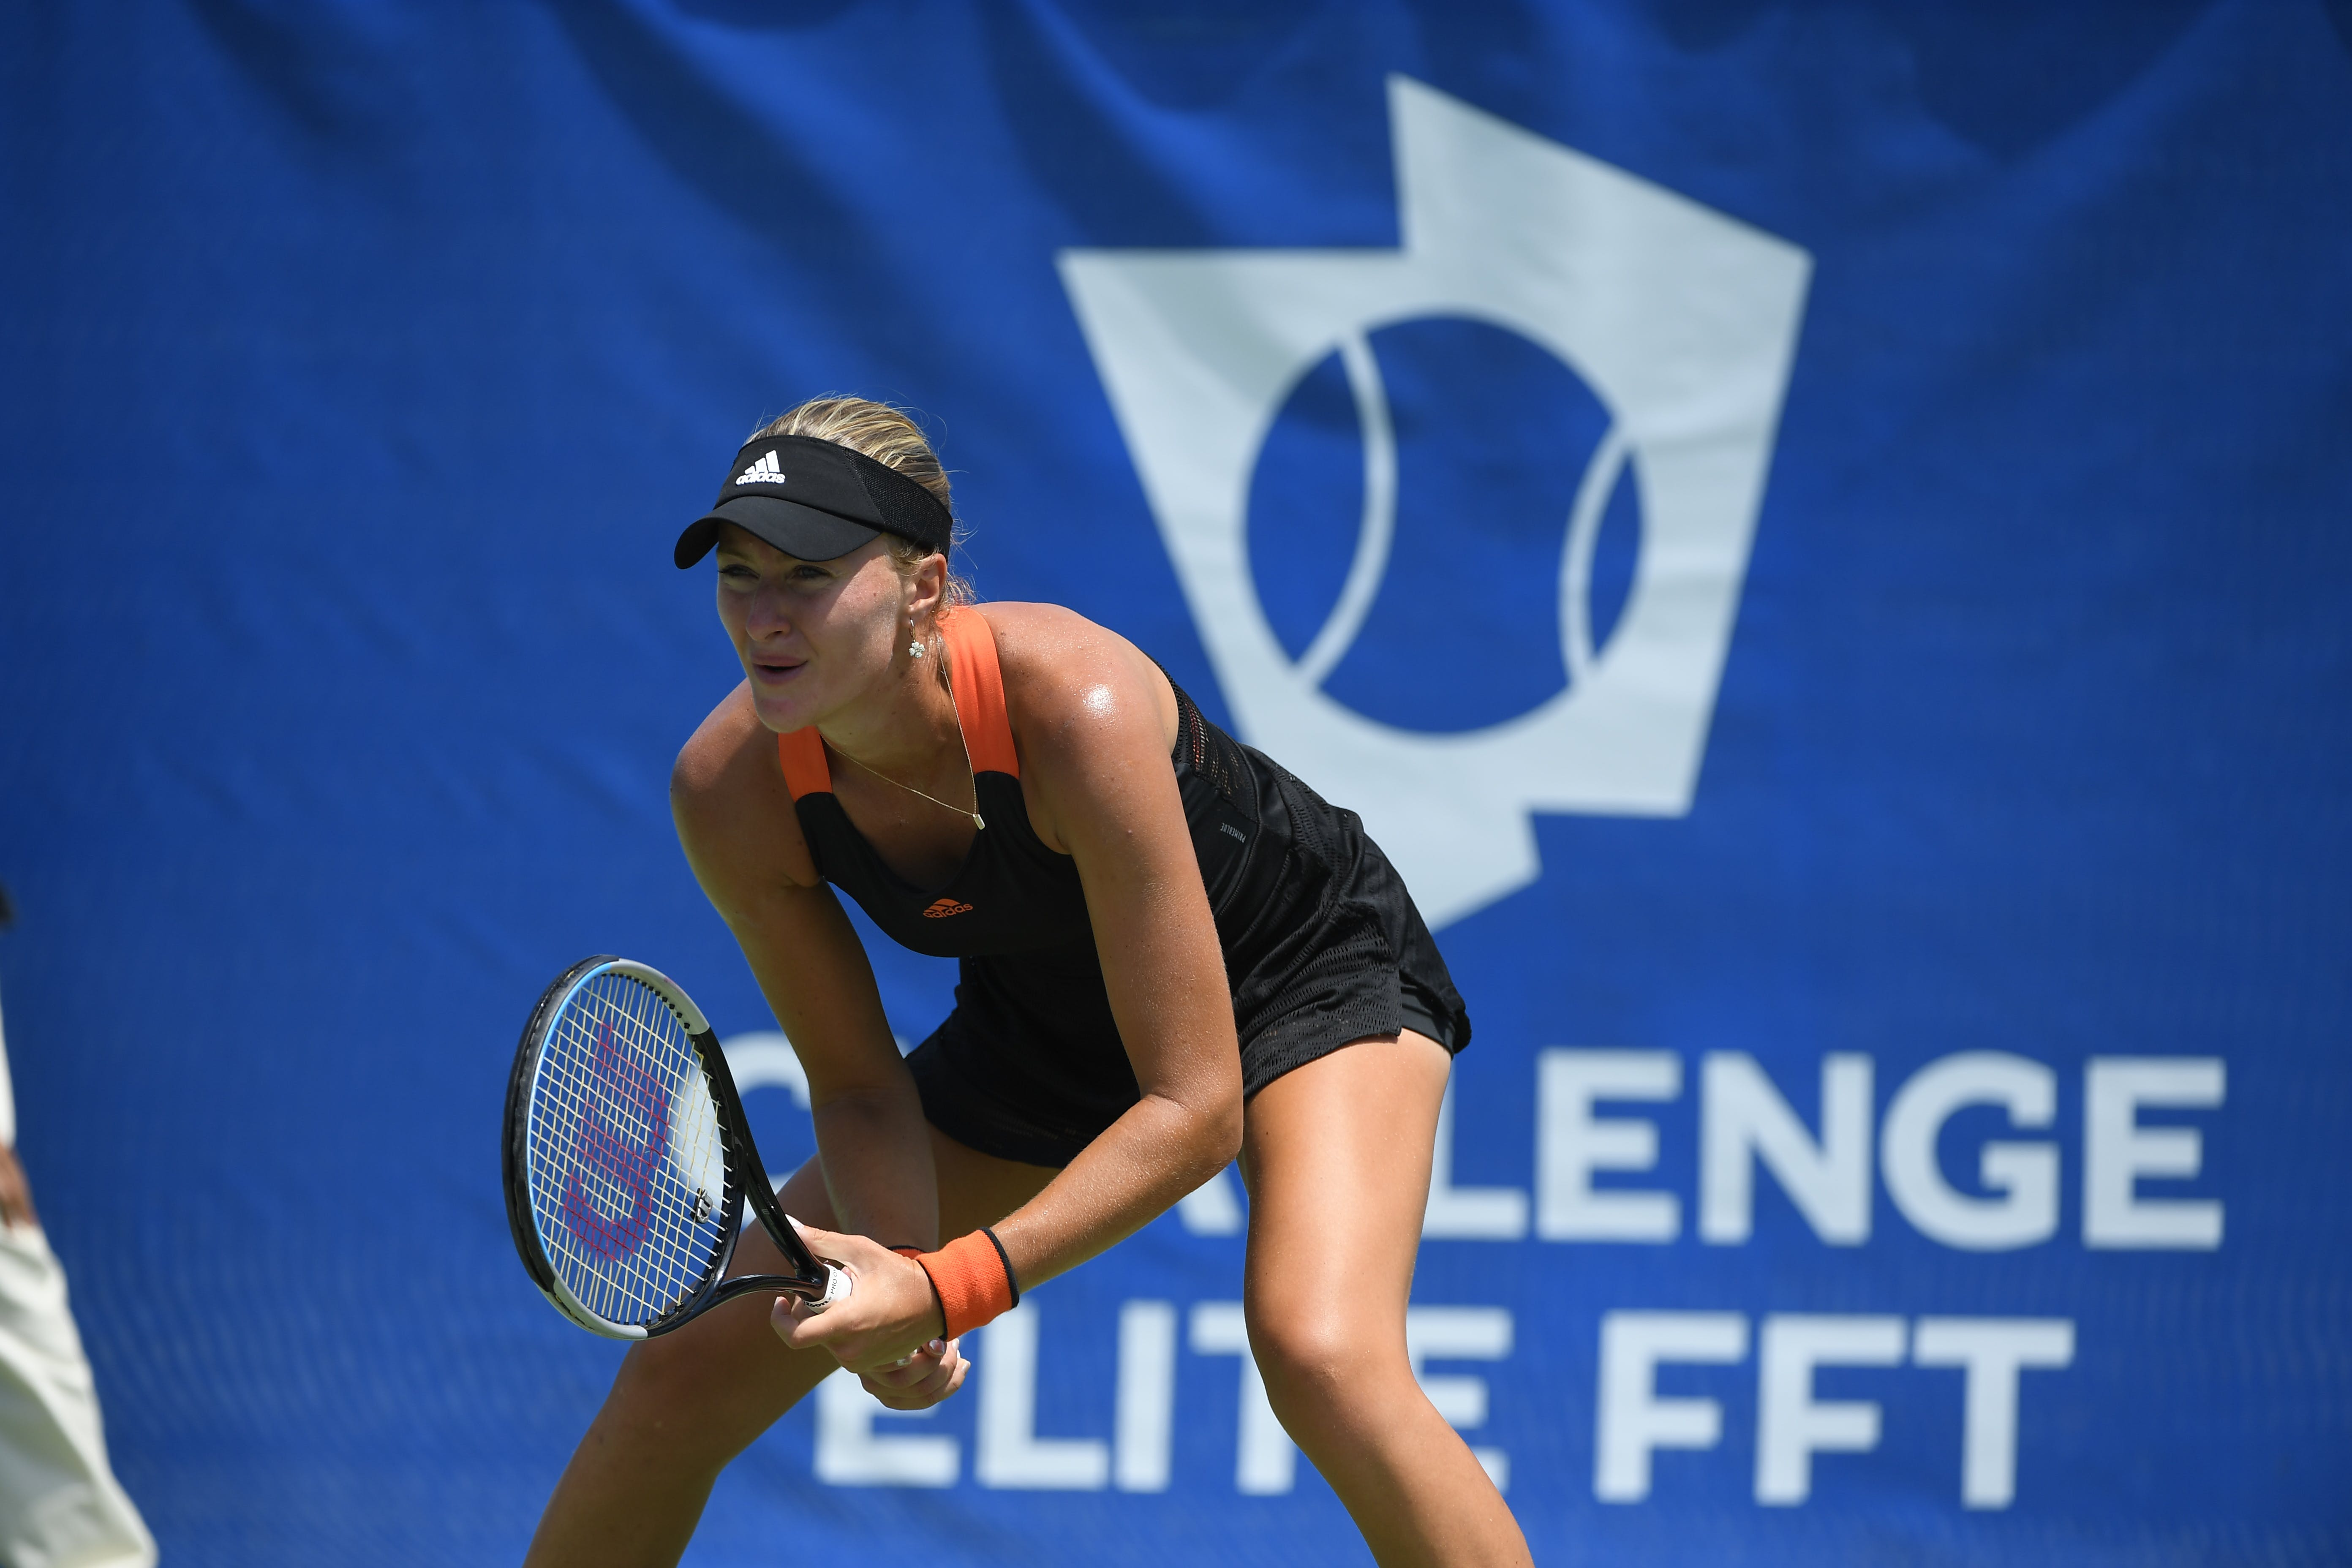 Kristina Mladenovic during the Challenge Elite FFT at Nice